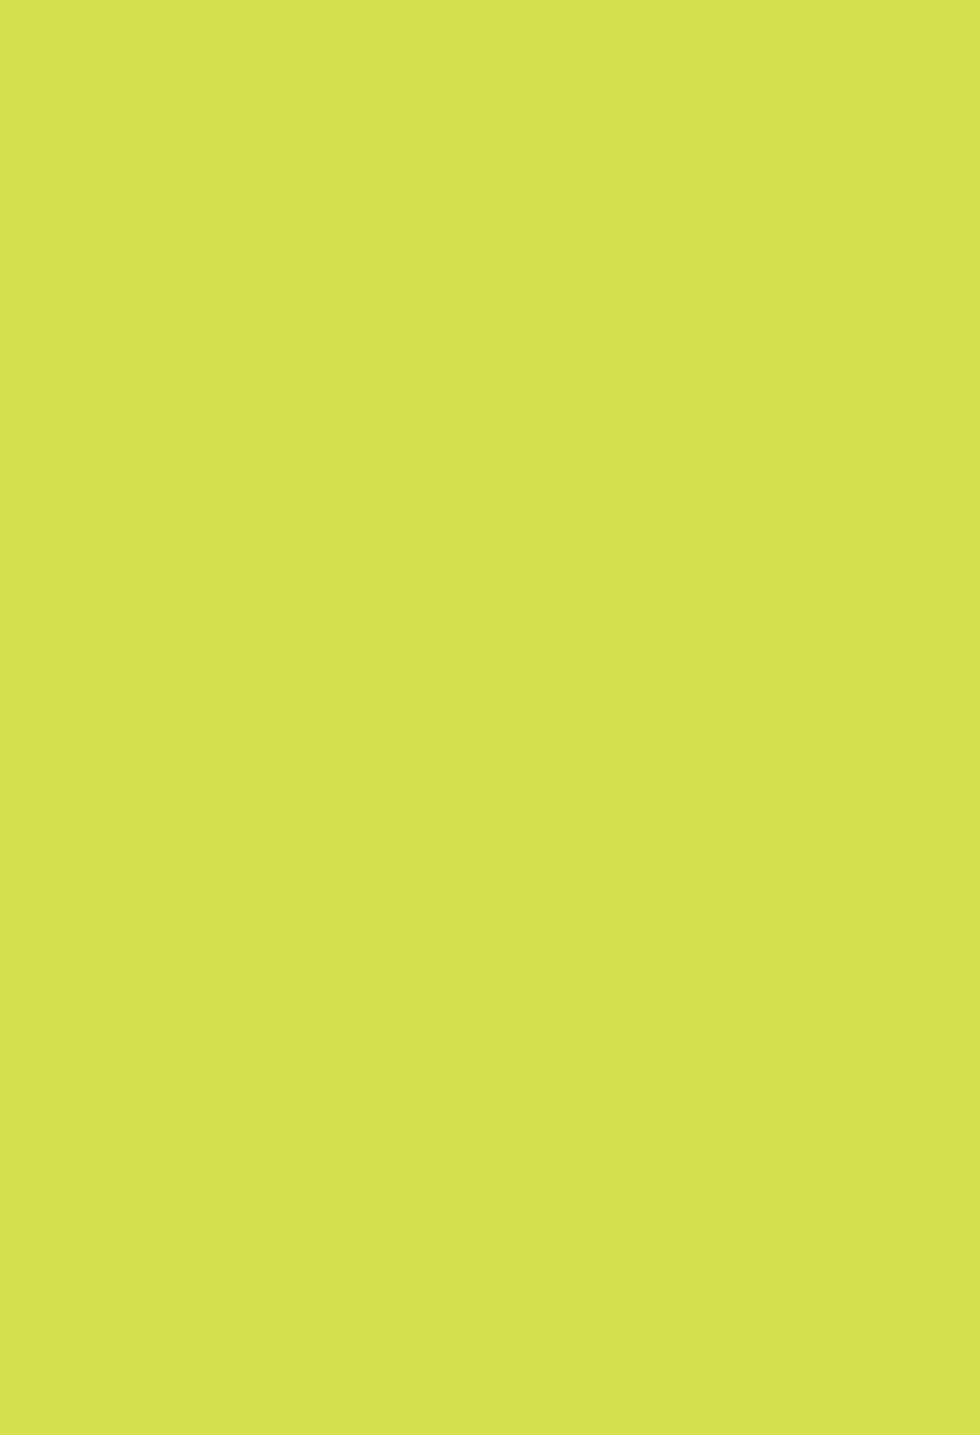 02_BG1.png